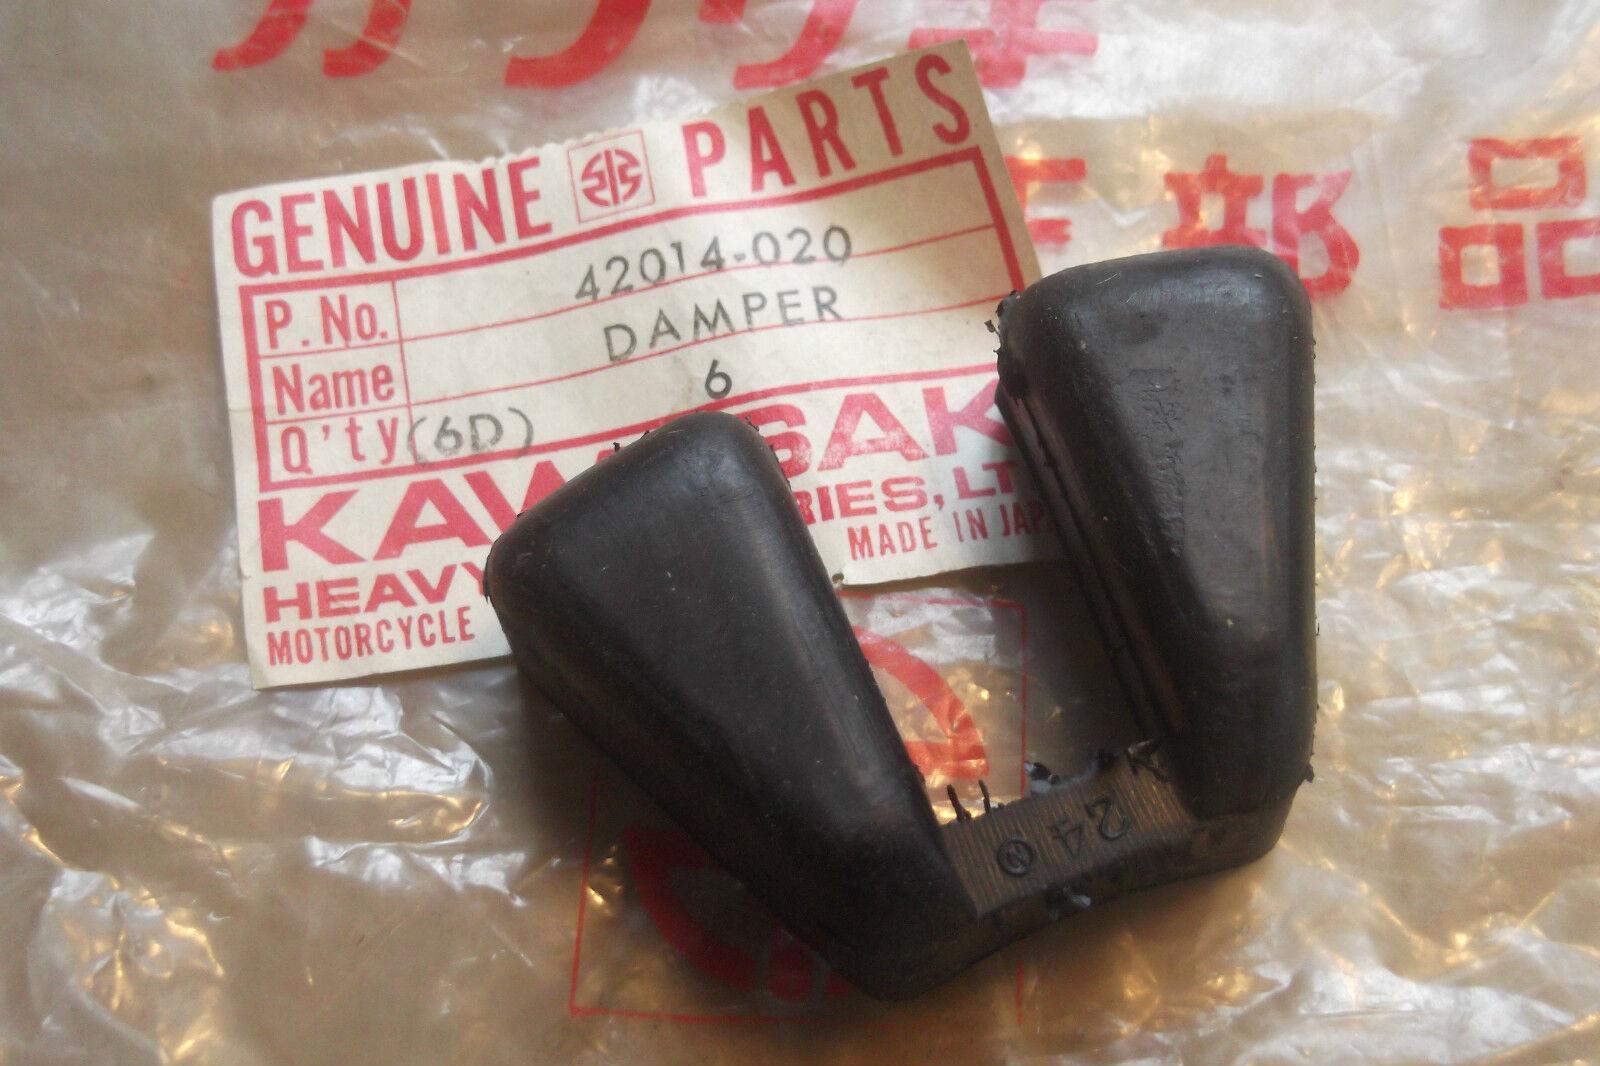 NOS Kawasaki 1973-1975 F11 Rear Hub Damper 42014-020